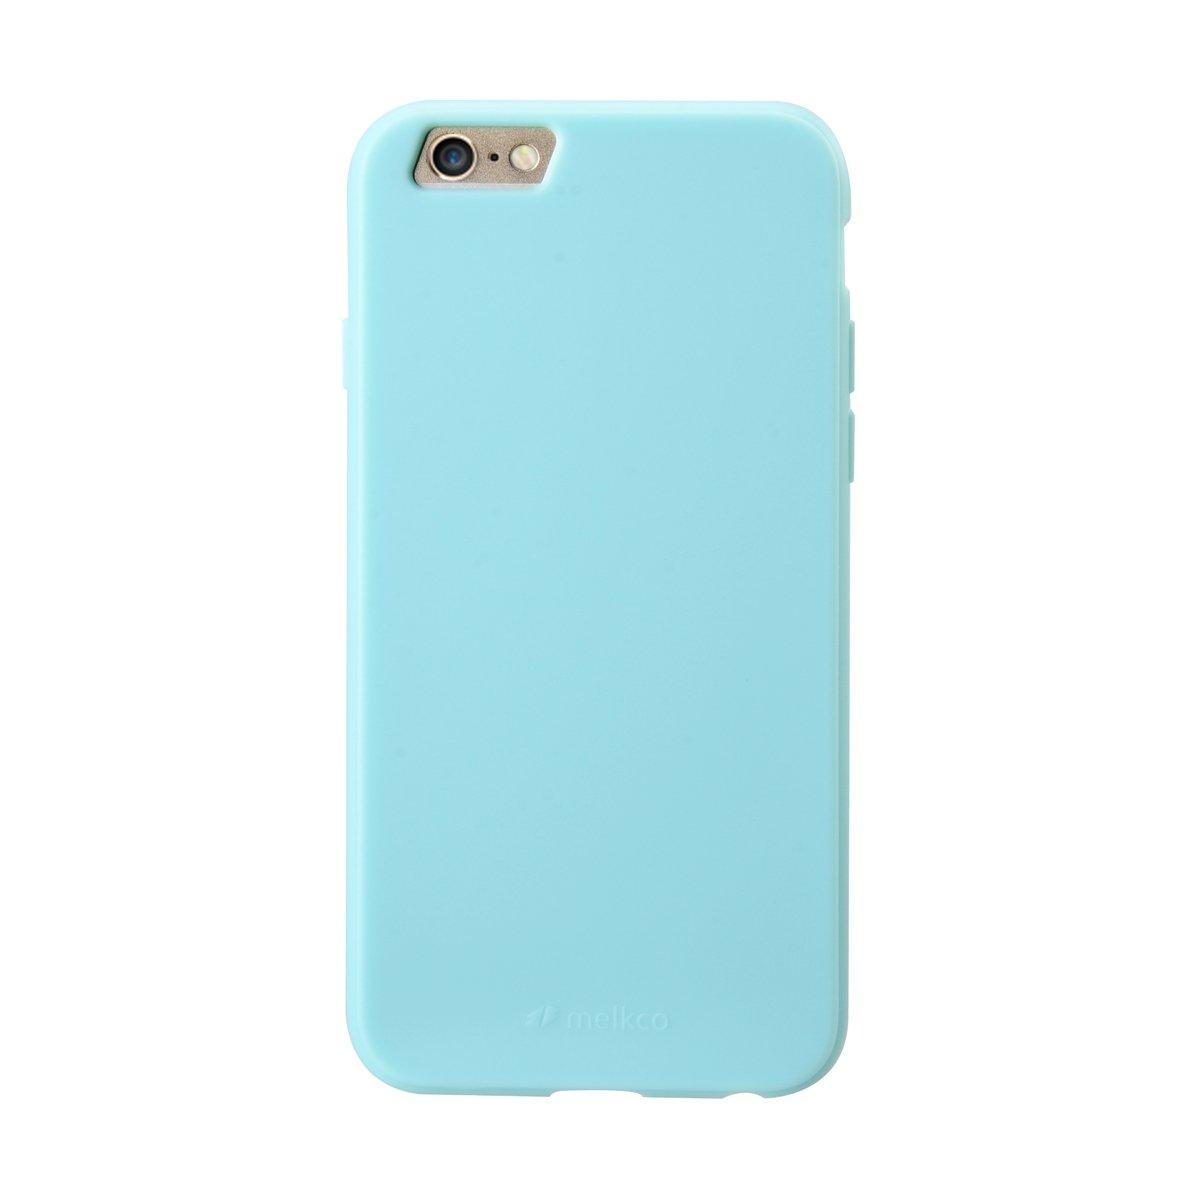 "iPhone 6 Plus/6S Plus (5.5"") Poly Jacket 手機保護殼 - 珍珠藍色(附送屏幕保護貼)"